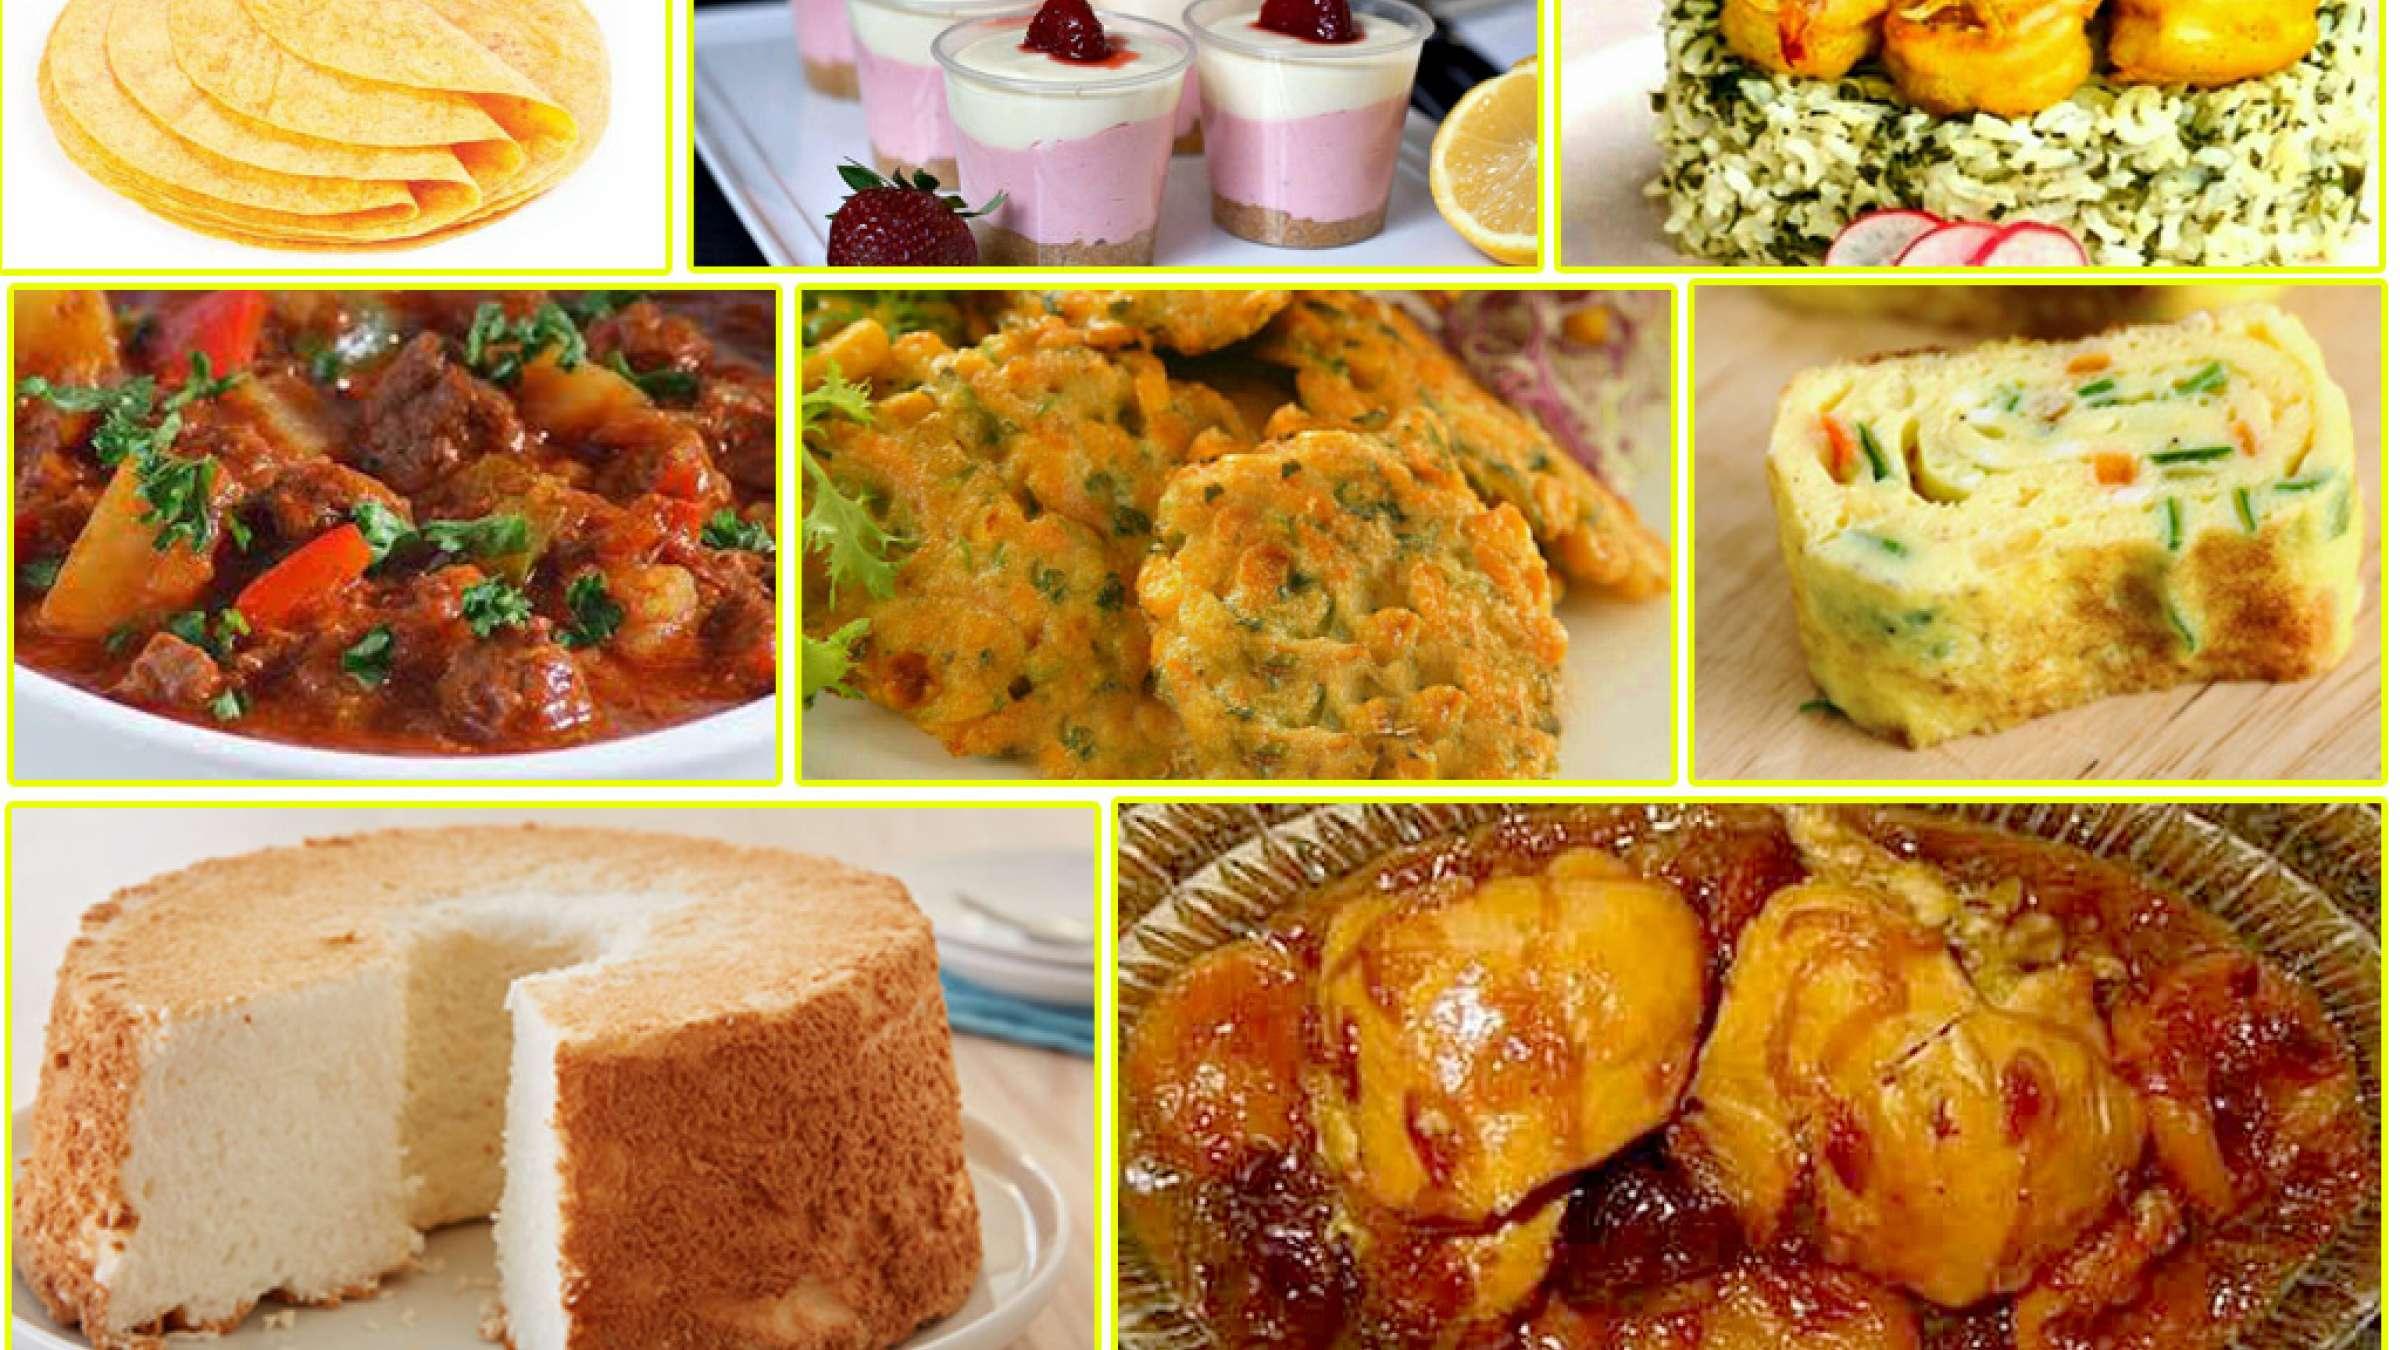 آشپزی-پروین-تورتیلا-خوراک-گولاش-آلو-اسفناج